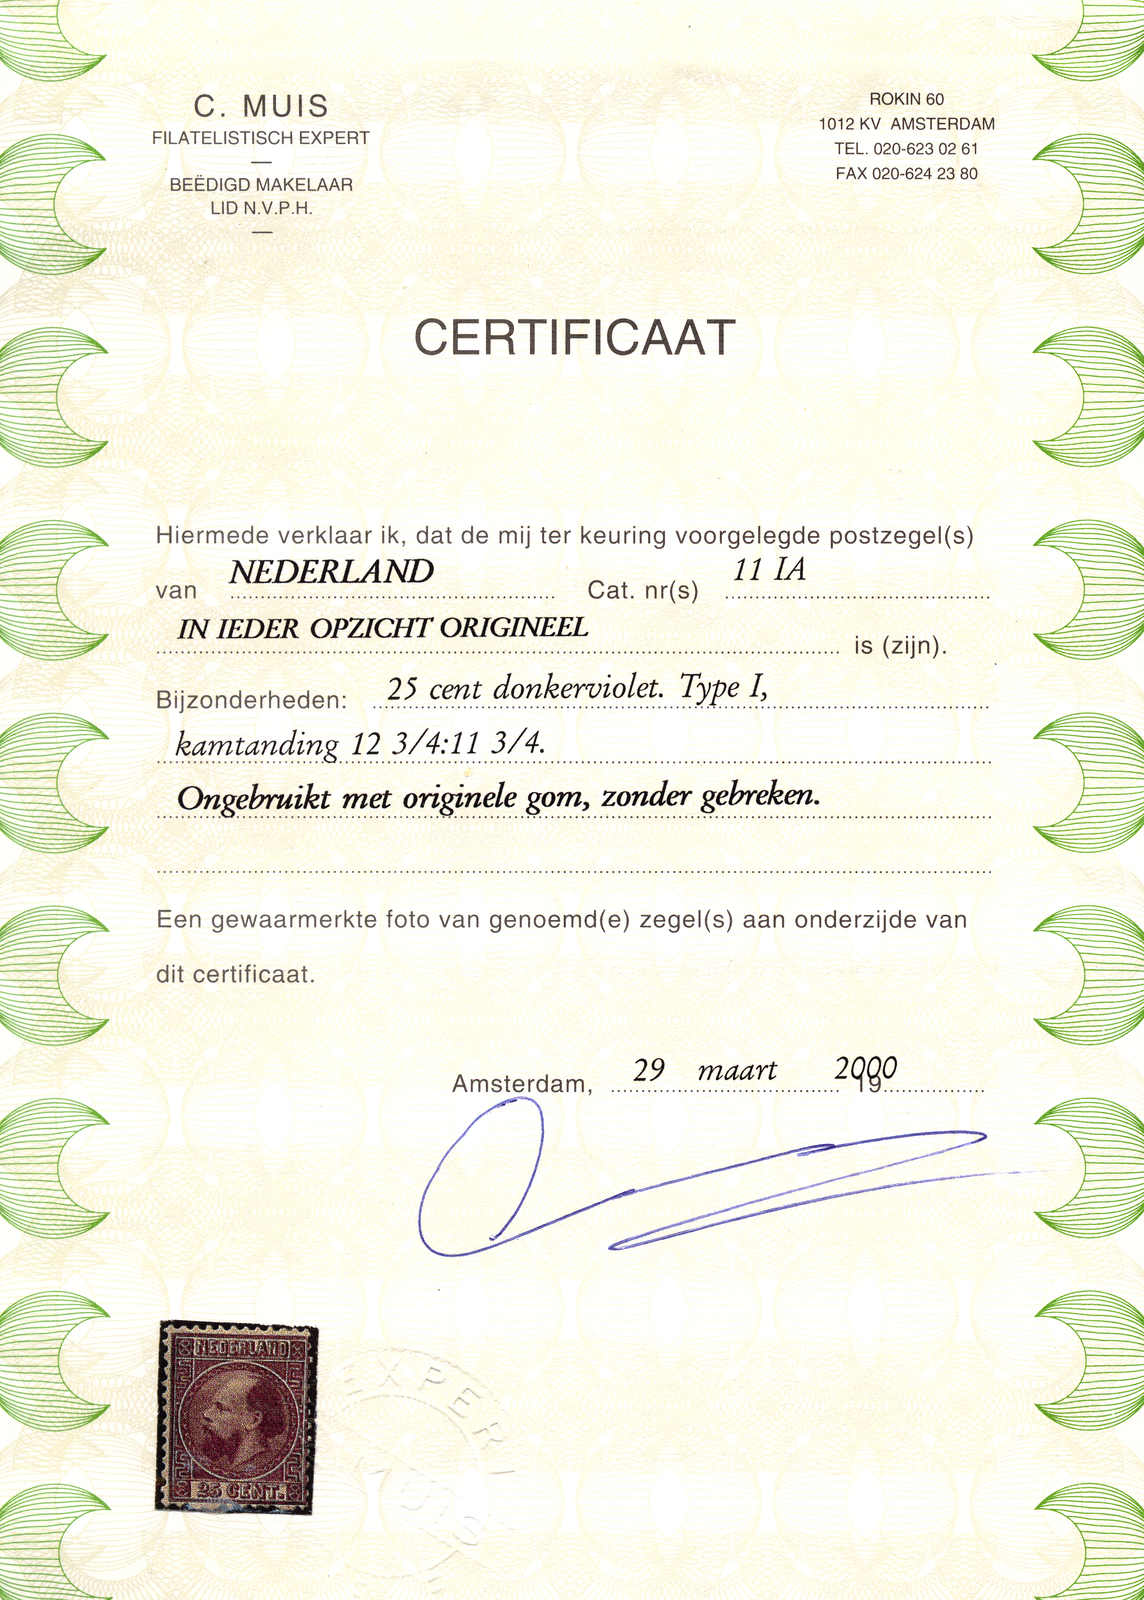 Lot 10133 - europe Netherlands -  classicphil GmbH 3 rd classicphil Auction - VIENNA- AUSTRIA